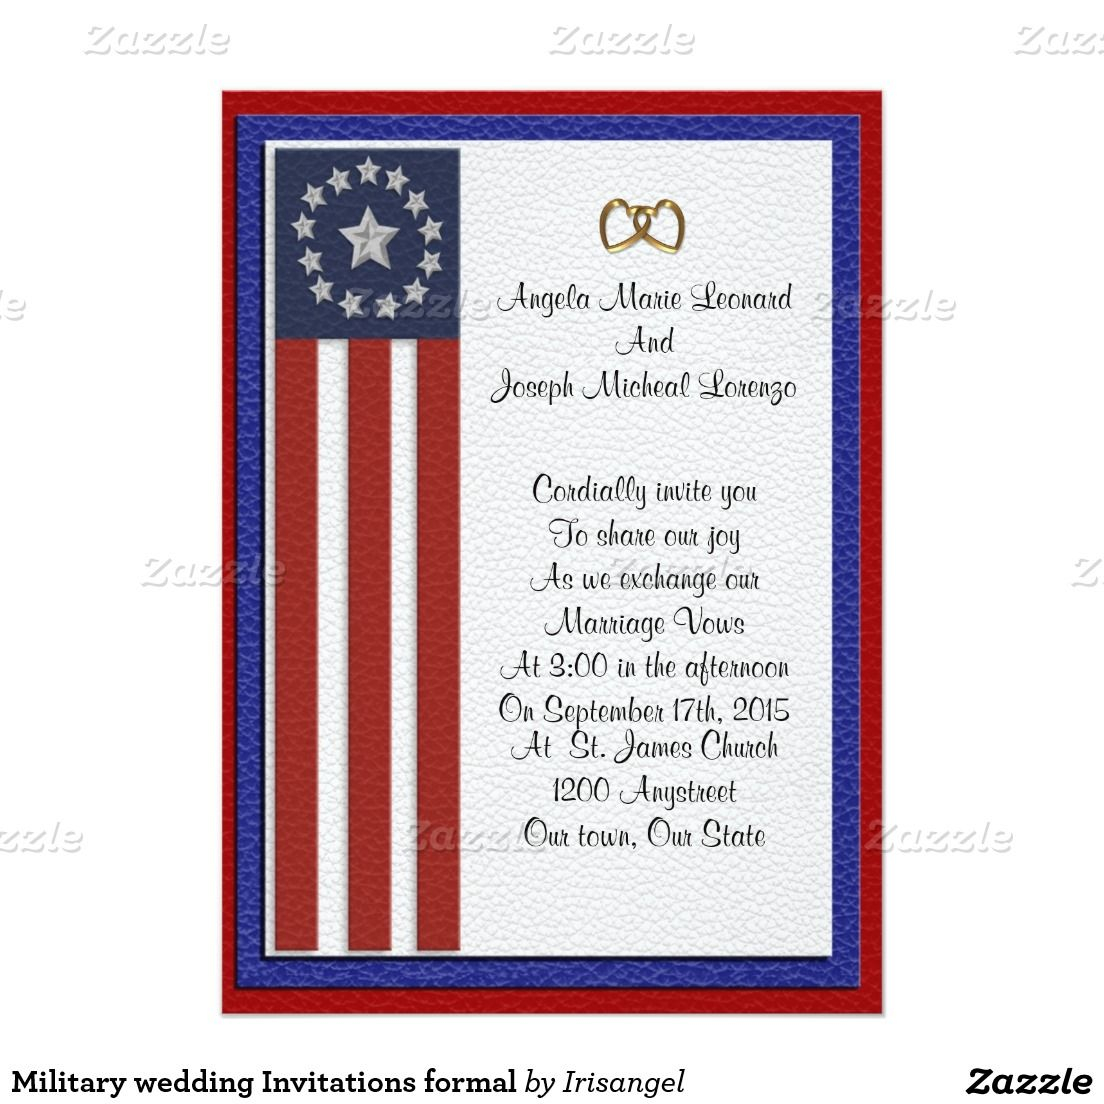 Military Wedding Invitations Formal Zazzle Military Wedding pertaining to sizing 1104 X 1104